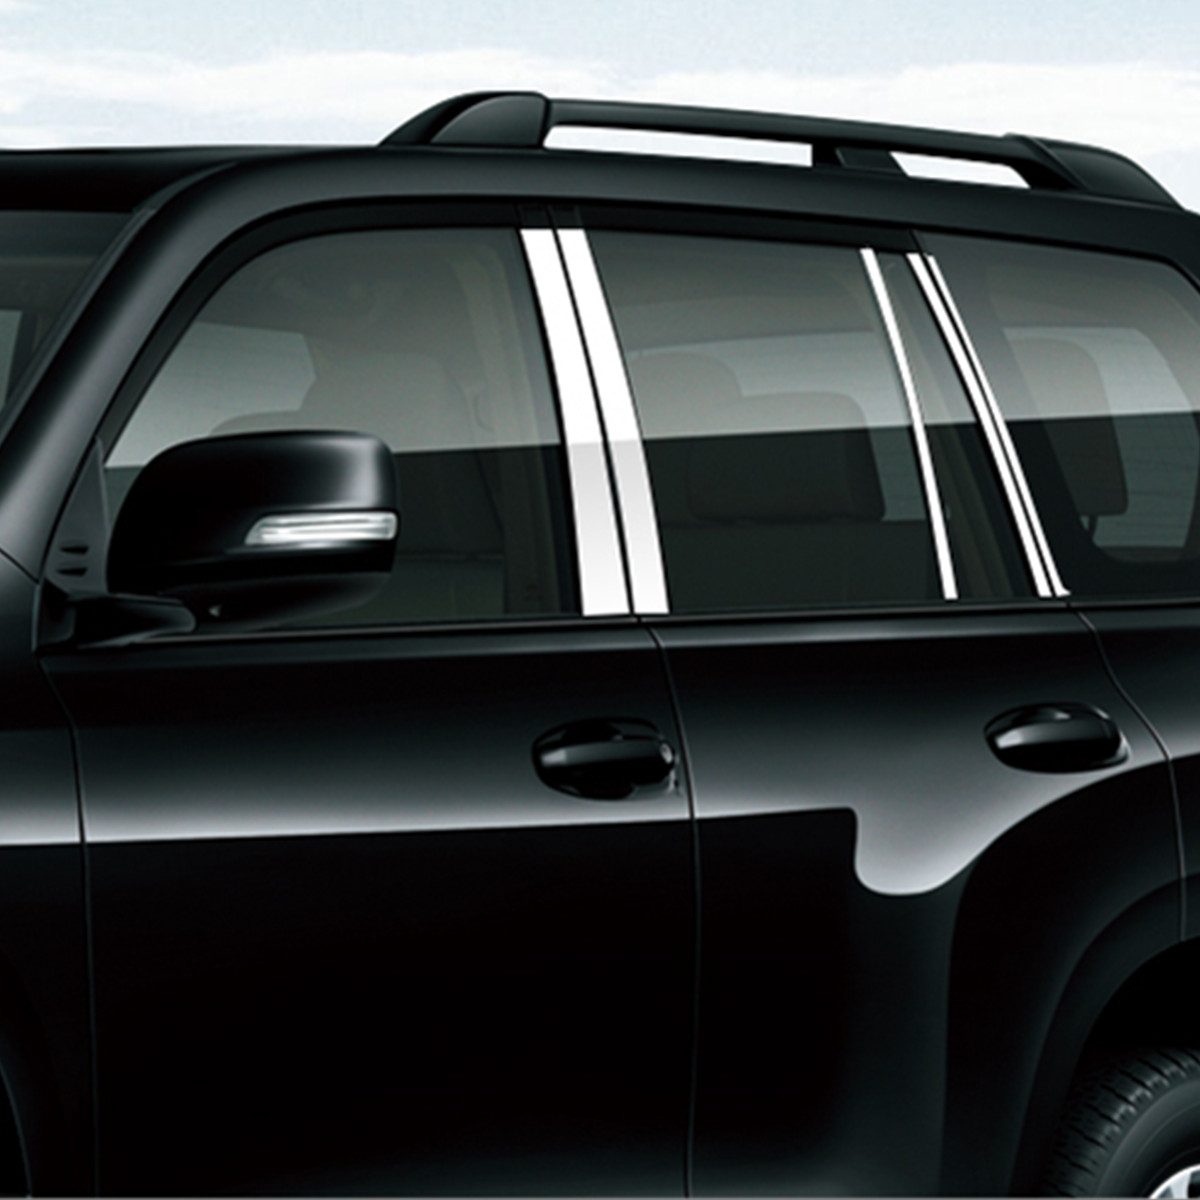 Accessories 10PCS set Stainless Steel Window Column Strip for Toyota Land Cruiser Prado 120 2003 2004